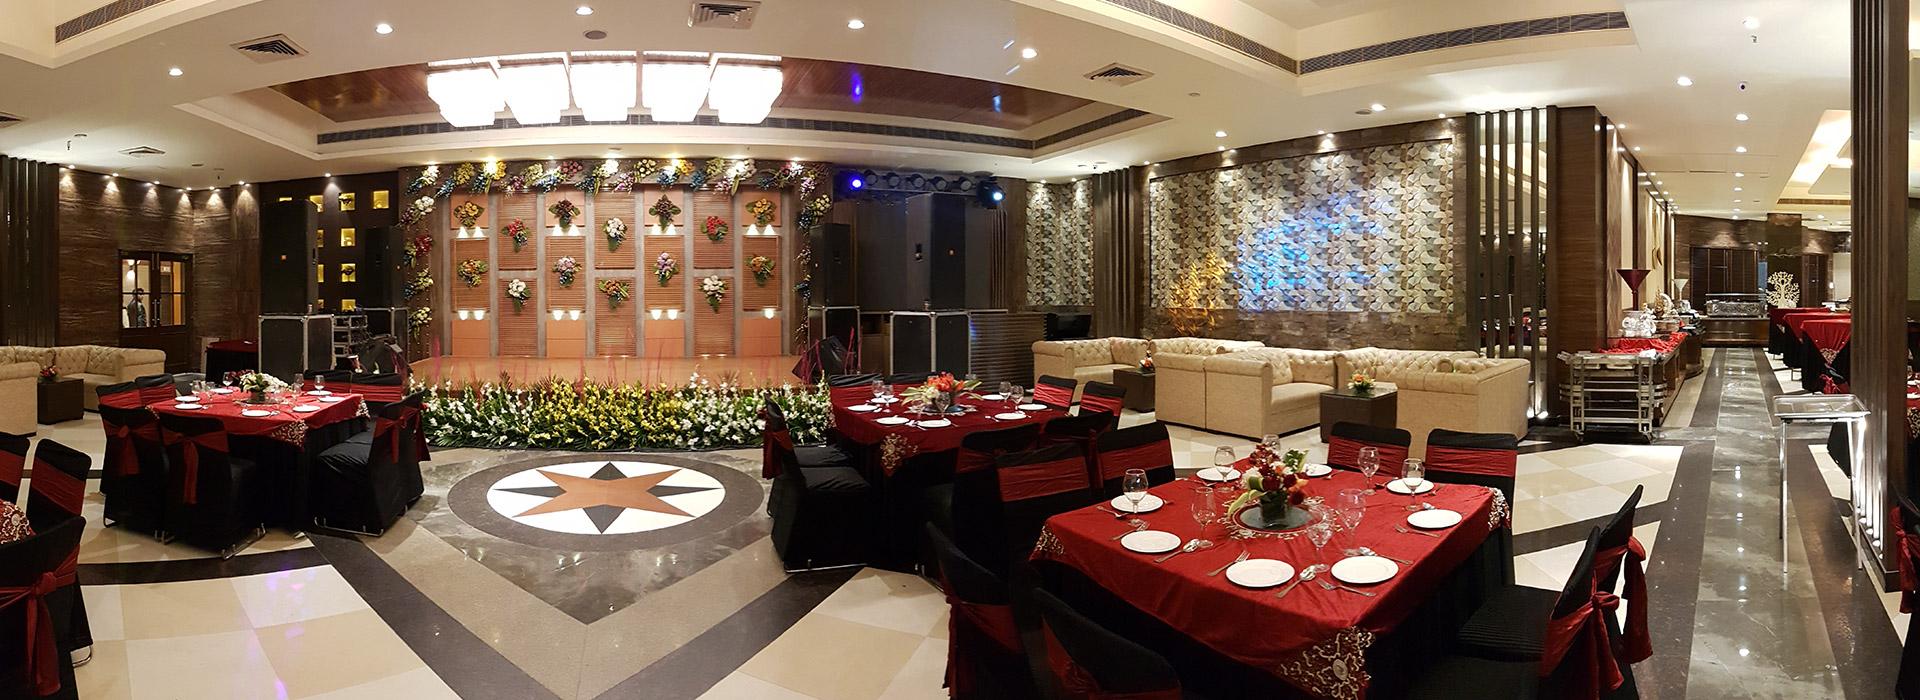 Casabella Banquet Hall In Gurgaon Wedding Venue Gurgaon